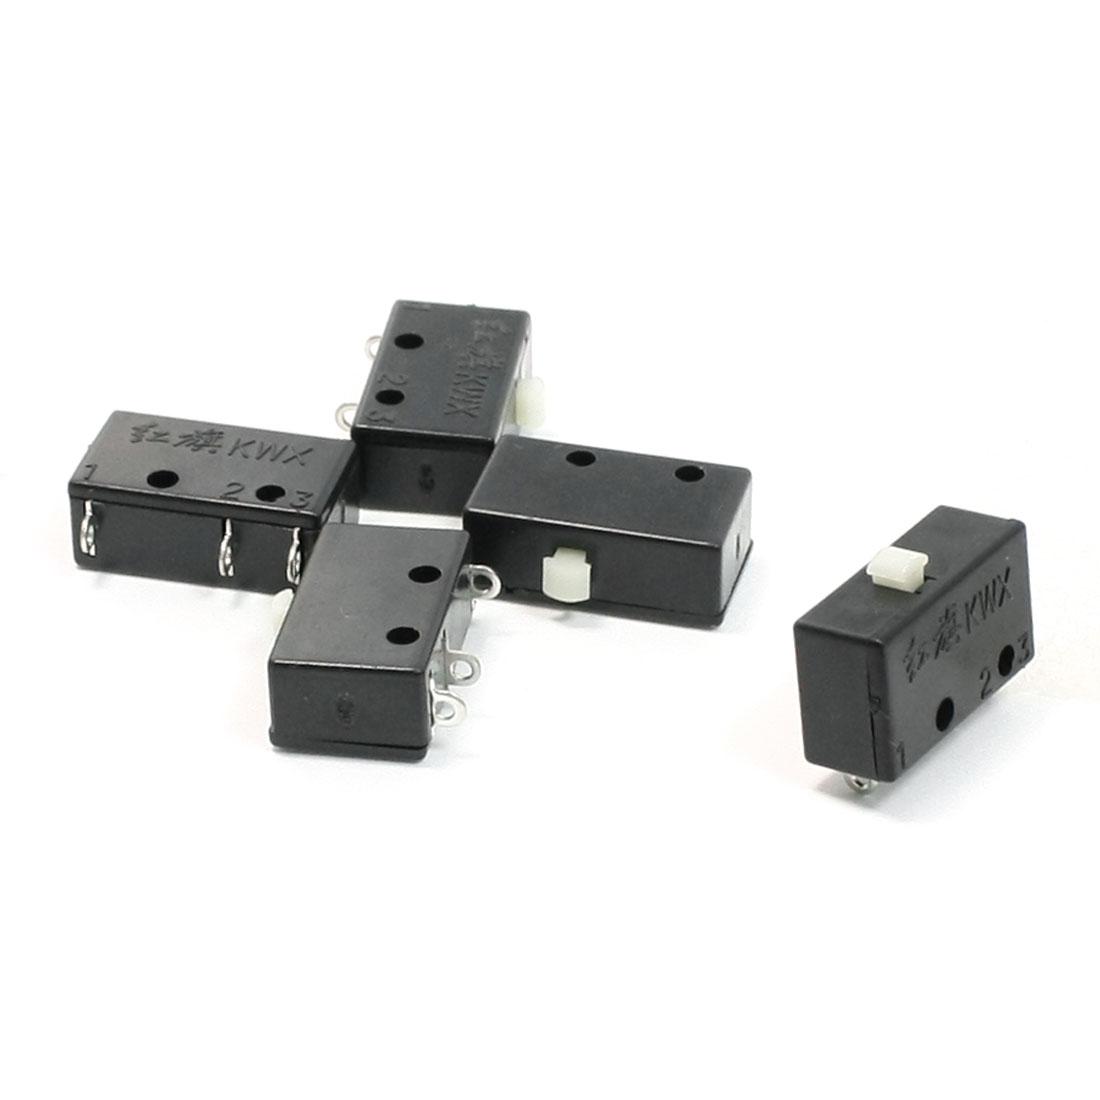 5 Pcs 5A 125V 3A 250V AC Non Locking Button Miniature Micro Switch Black